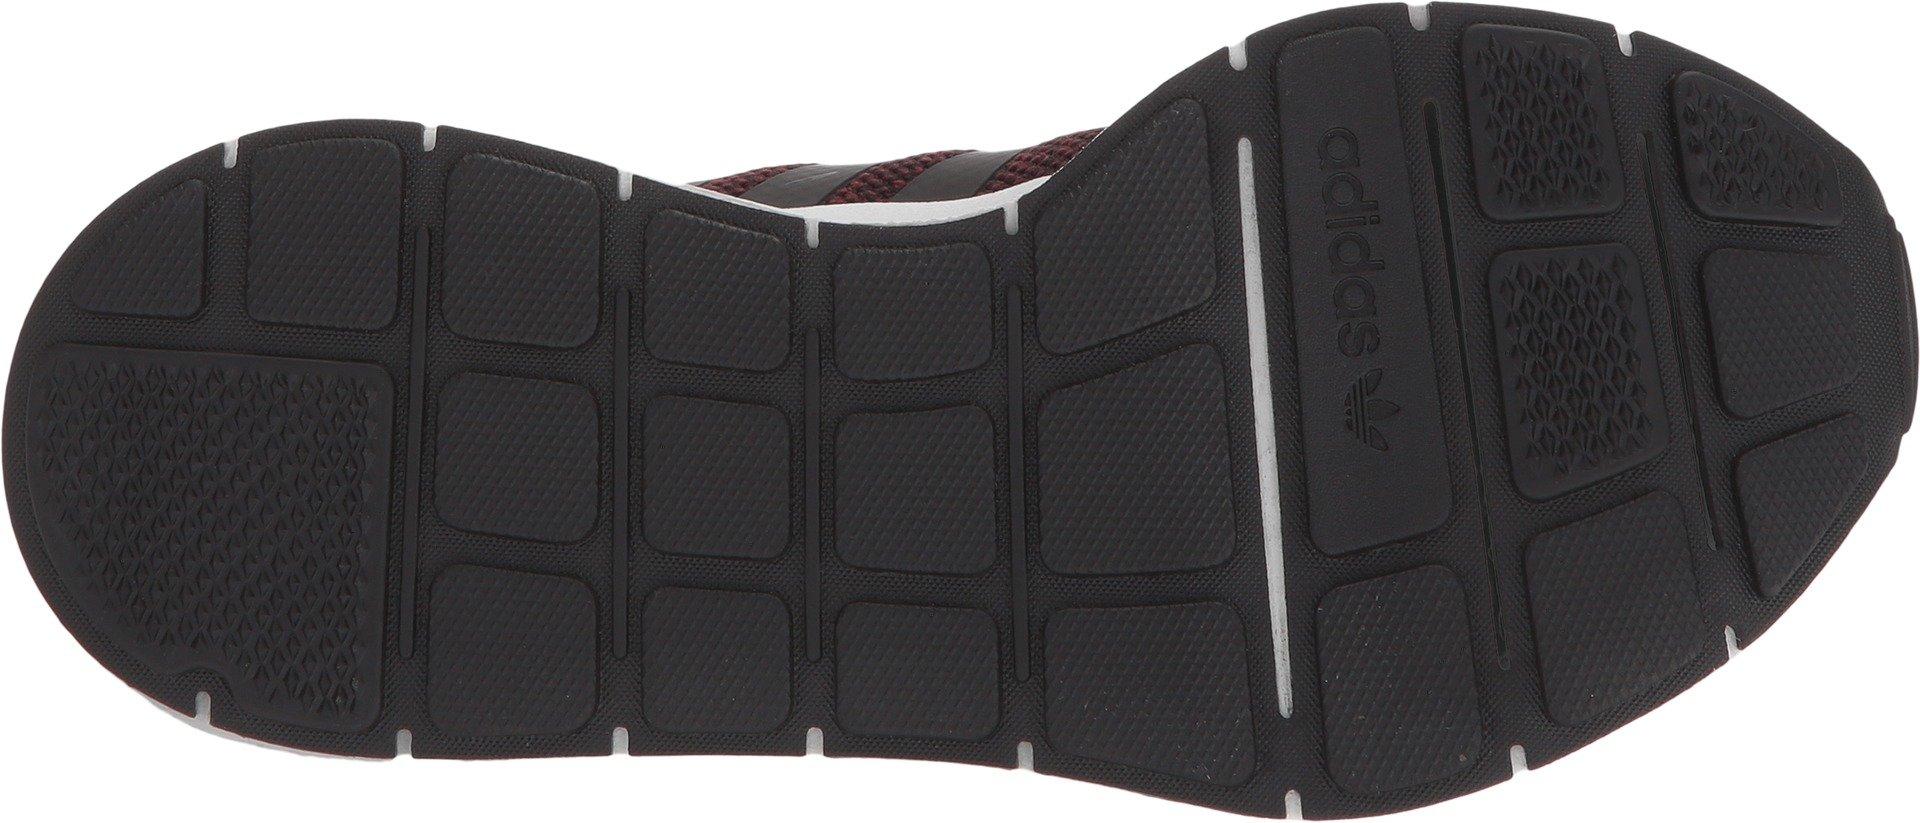 adidas Originals Boys' Swift Running Shoe, Maroon/core Black/White, 6 M US Big Kid by adidas Originals